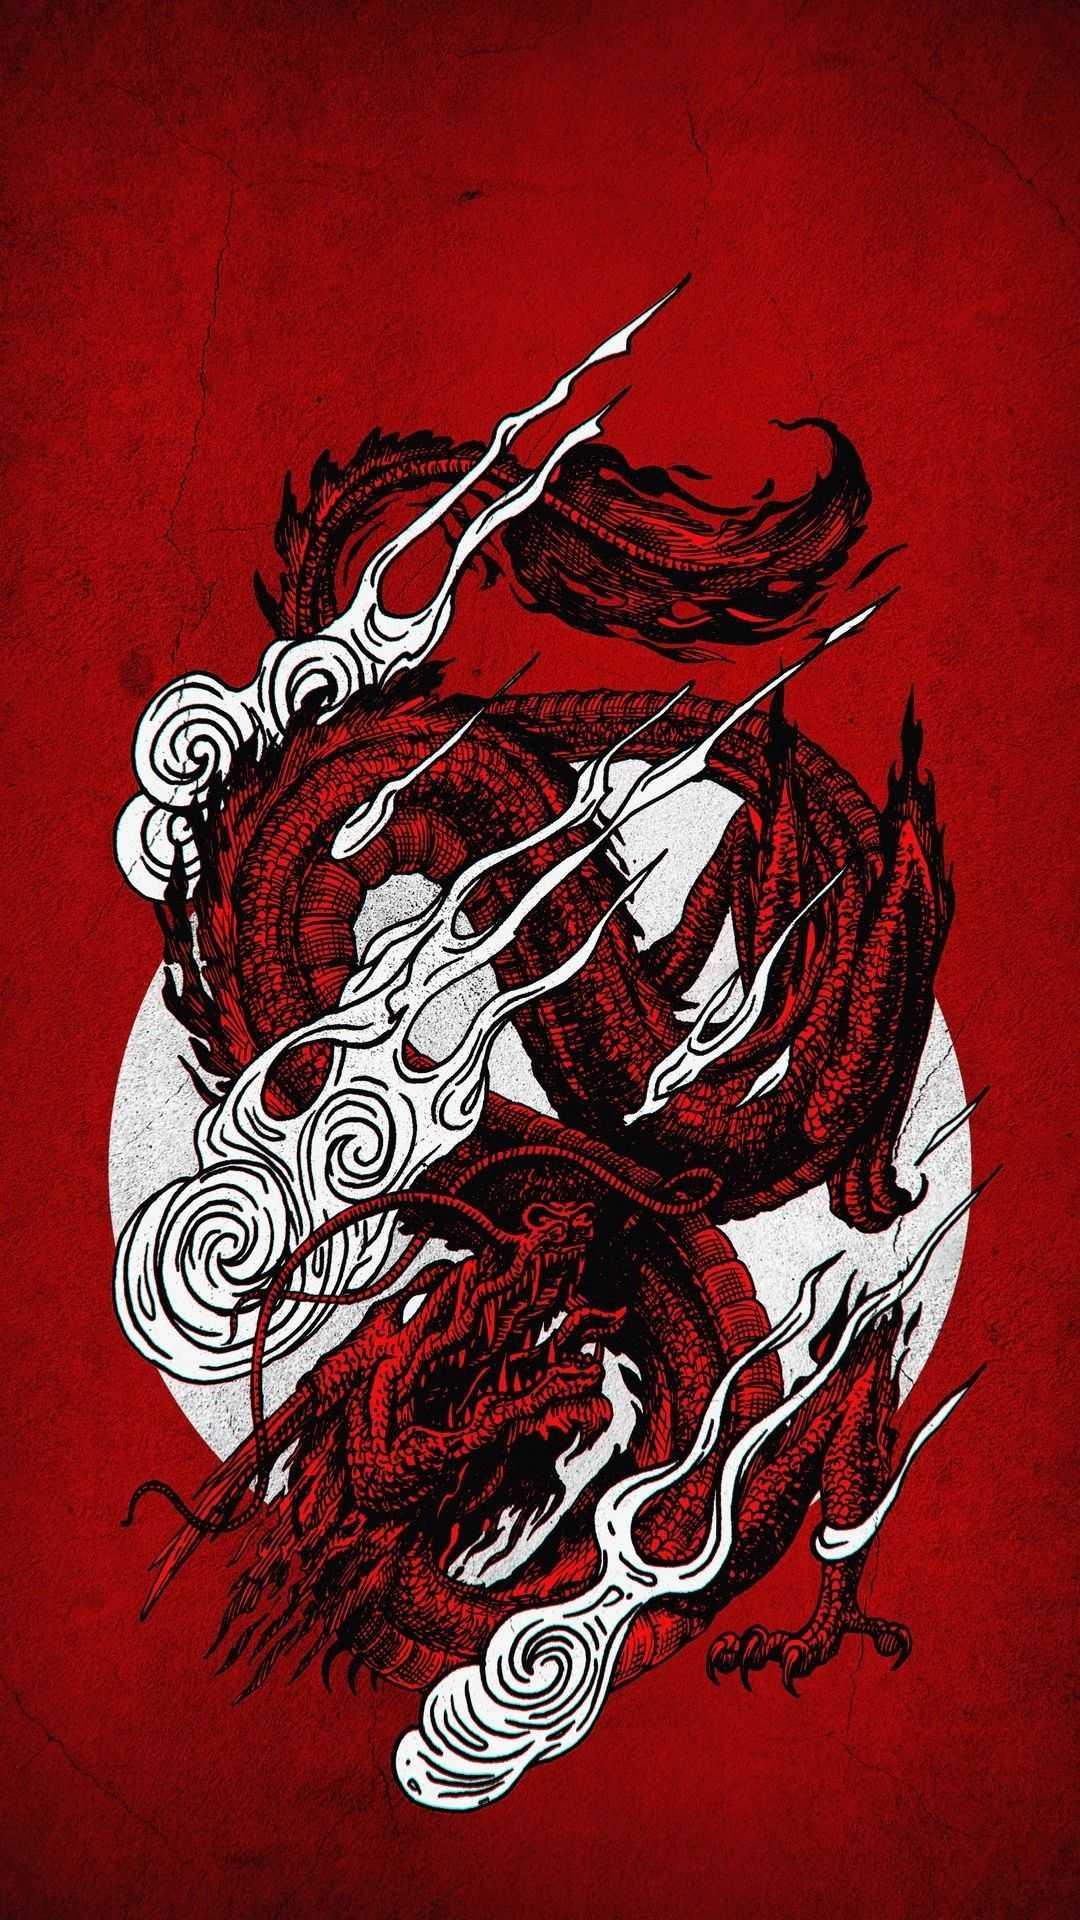 Tokyo Japan Dragon Wallpaper Kolpaper Awesome Free Hd Wallpapers